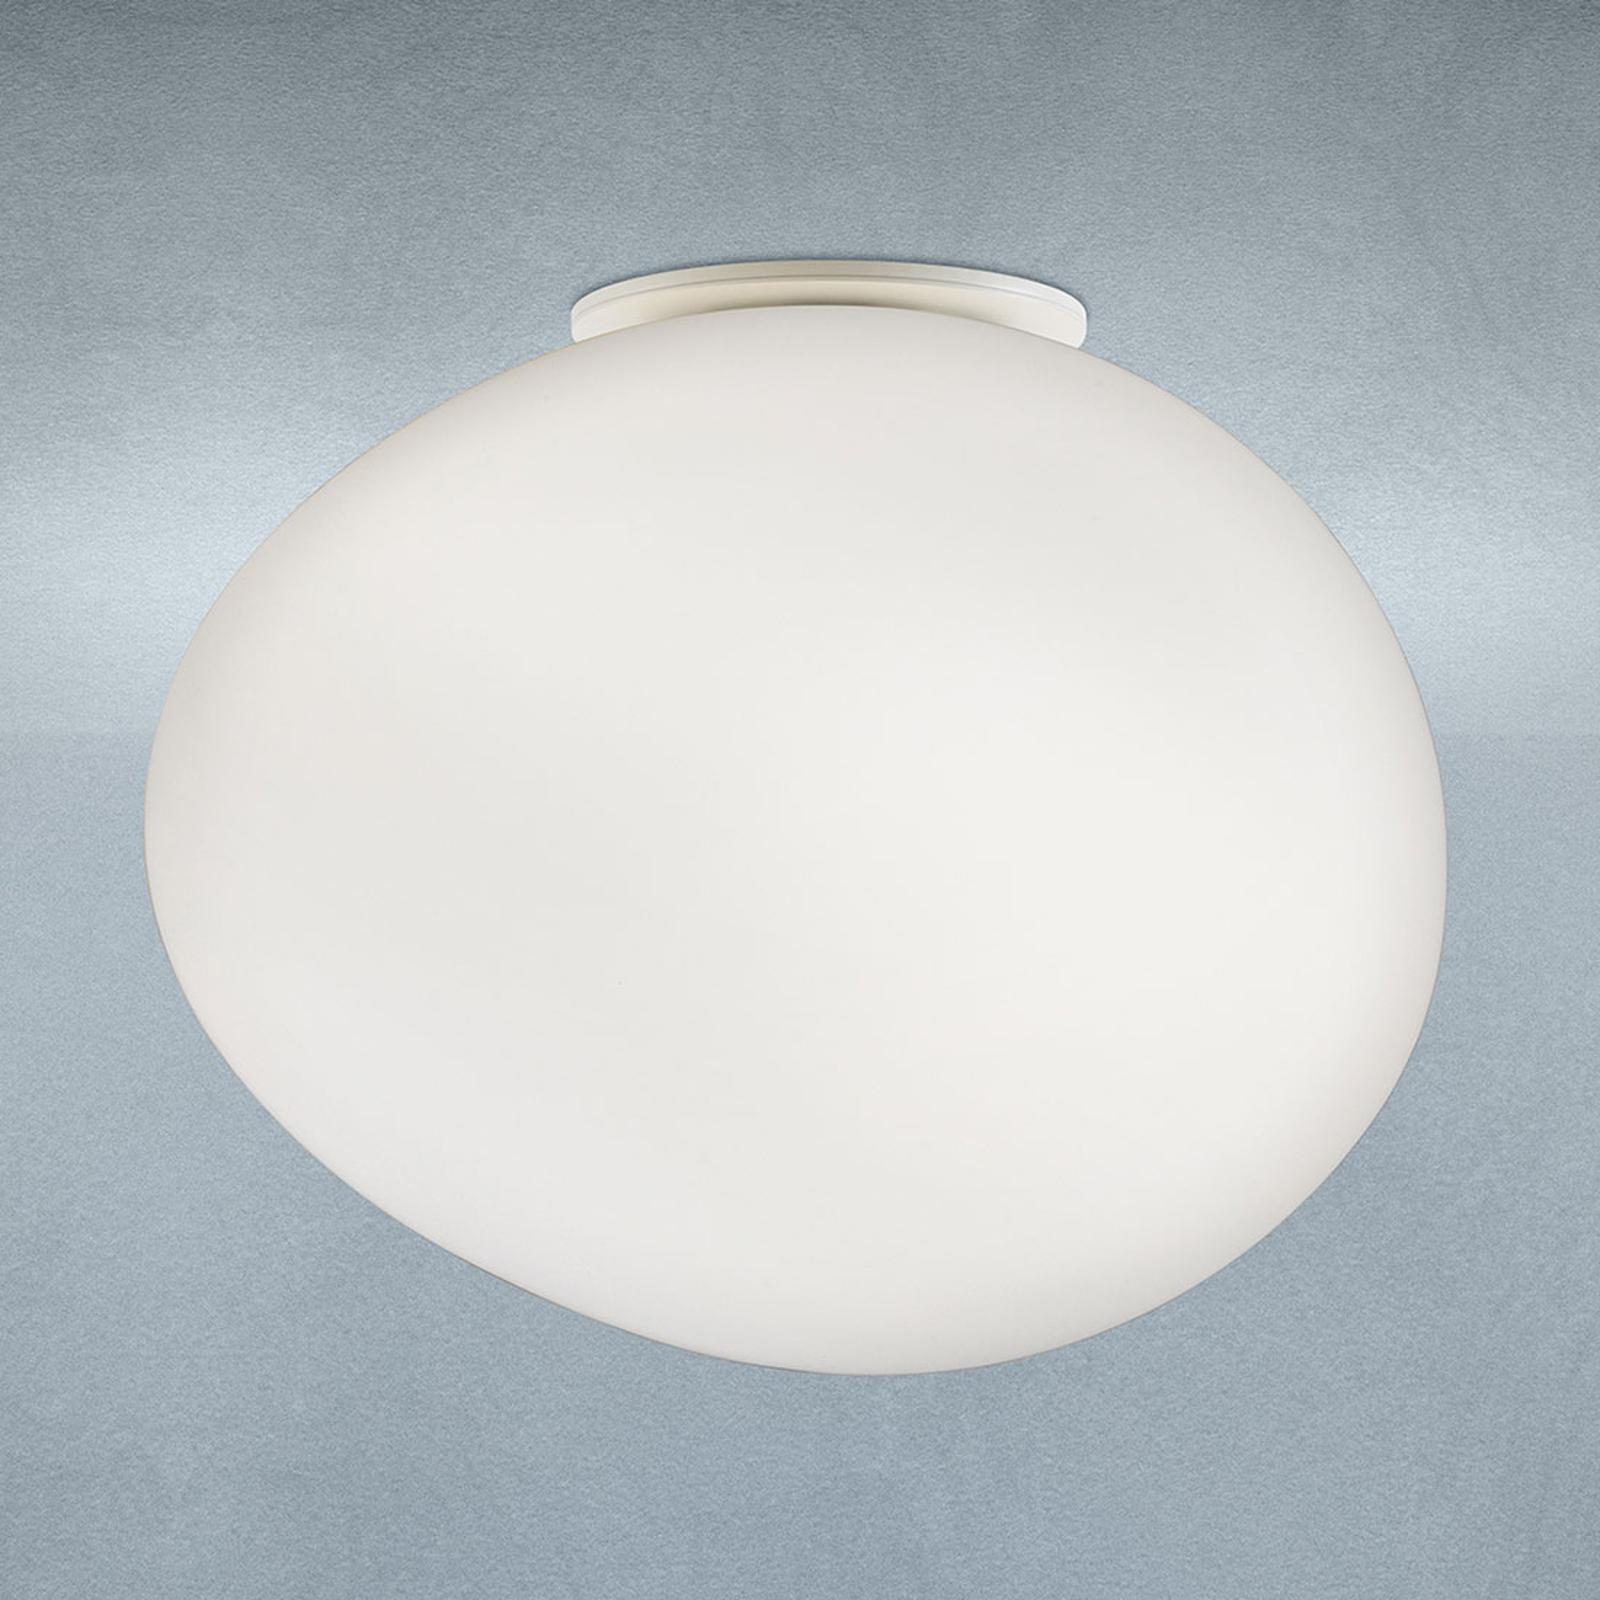 Foscarini Gregg media loftlampe af glas, 12 cm